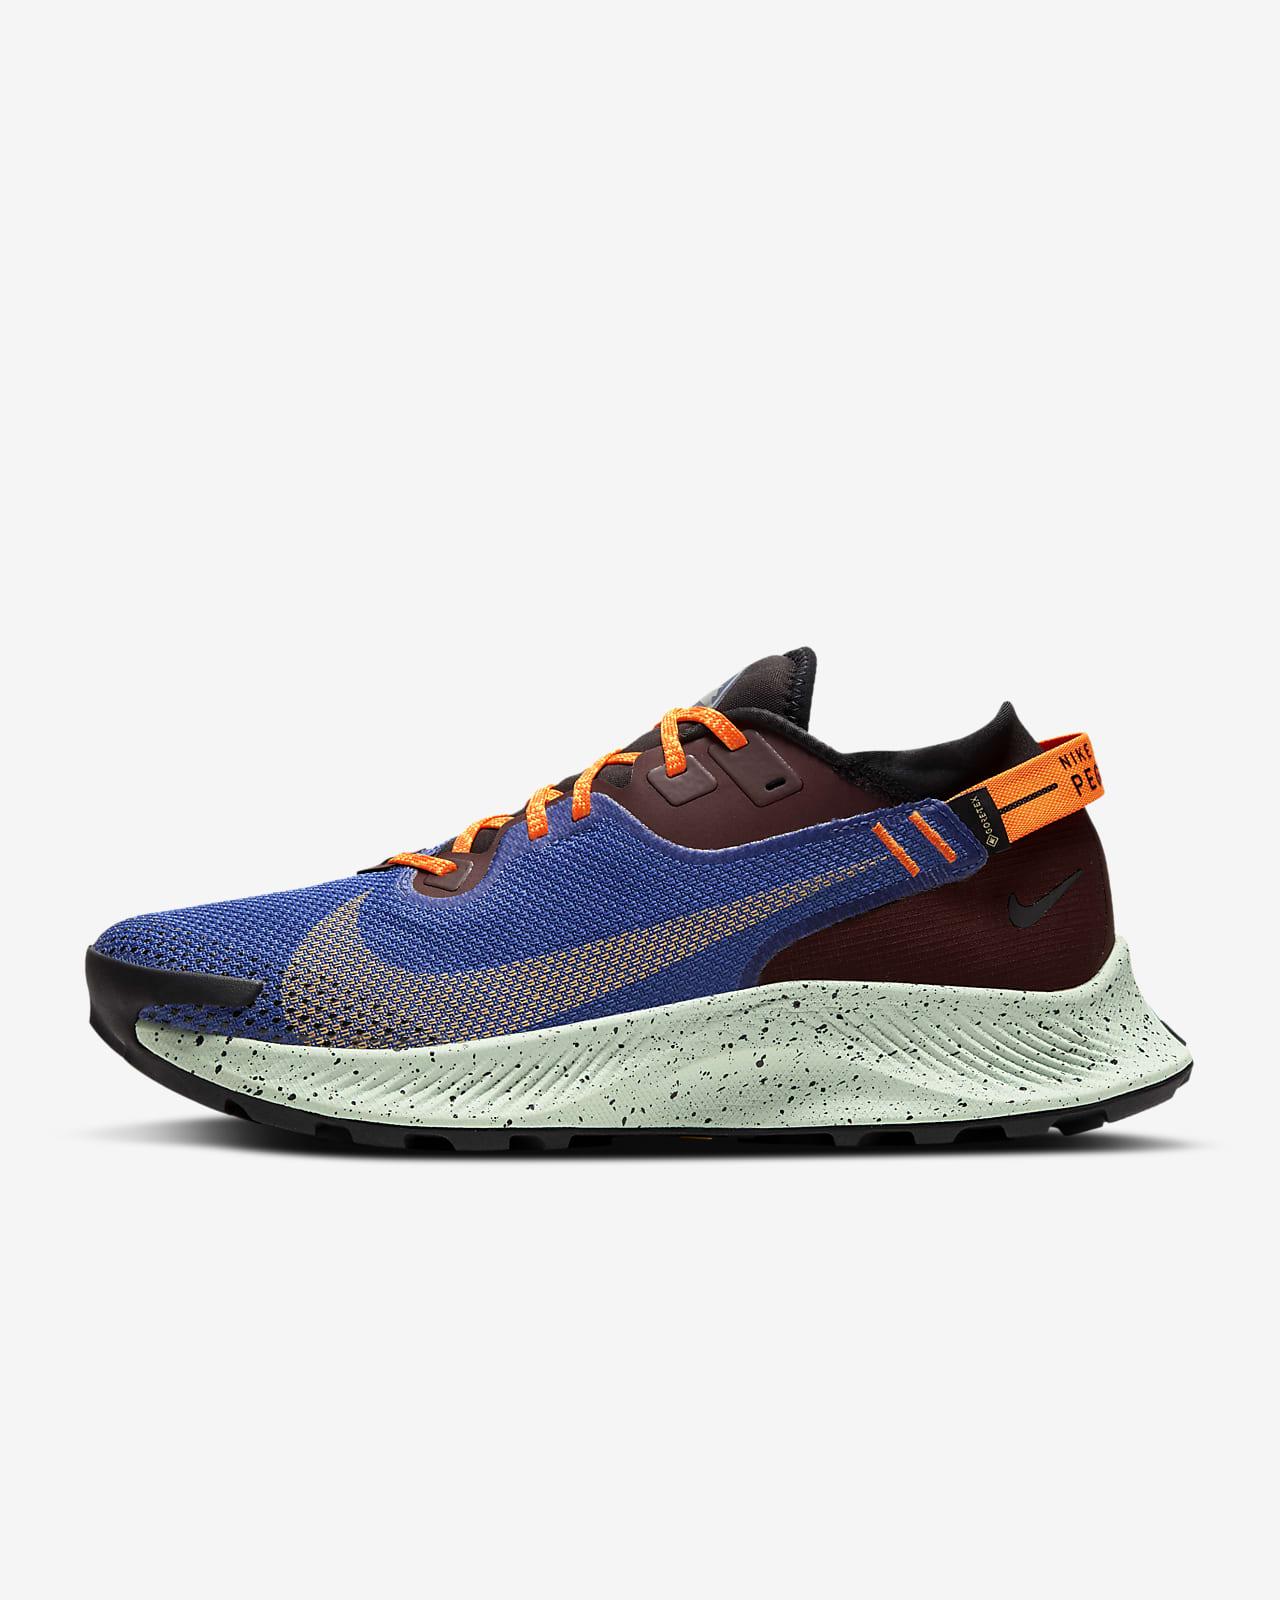 Nike Pegasus Trail 2 GORE-TEX 男款越野跑鞋